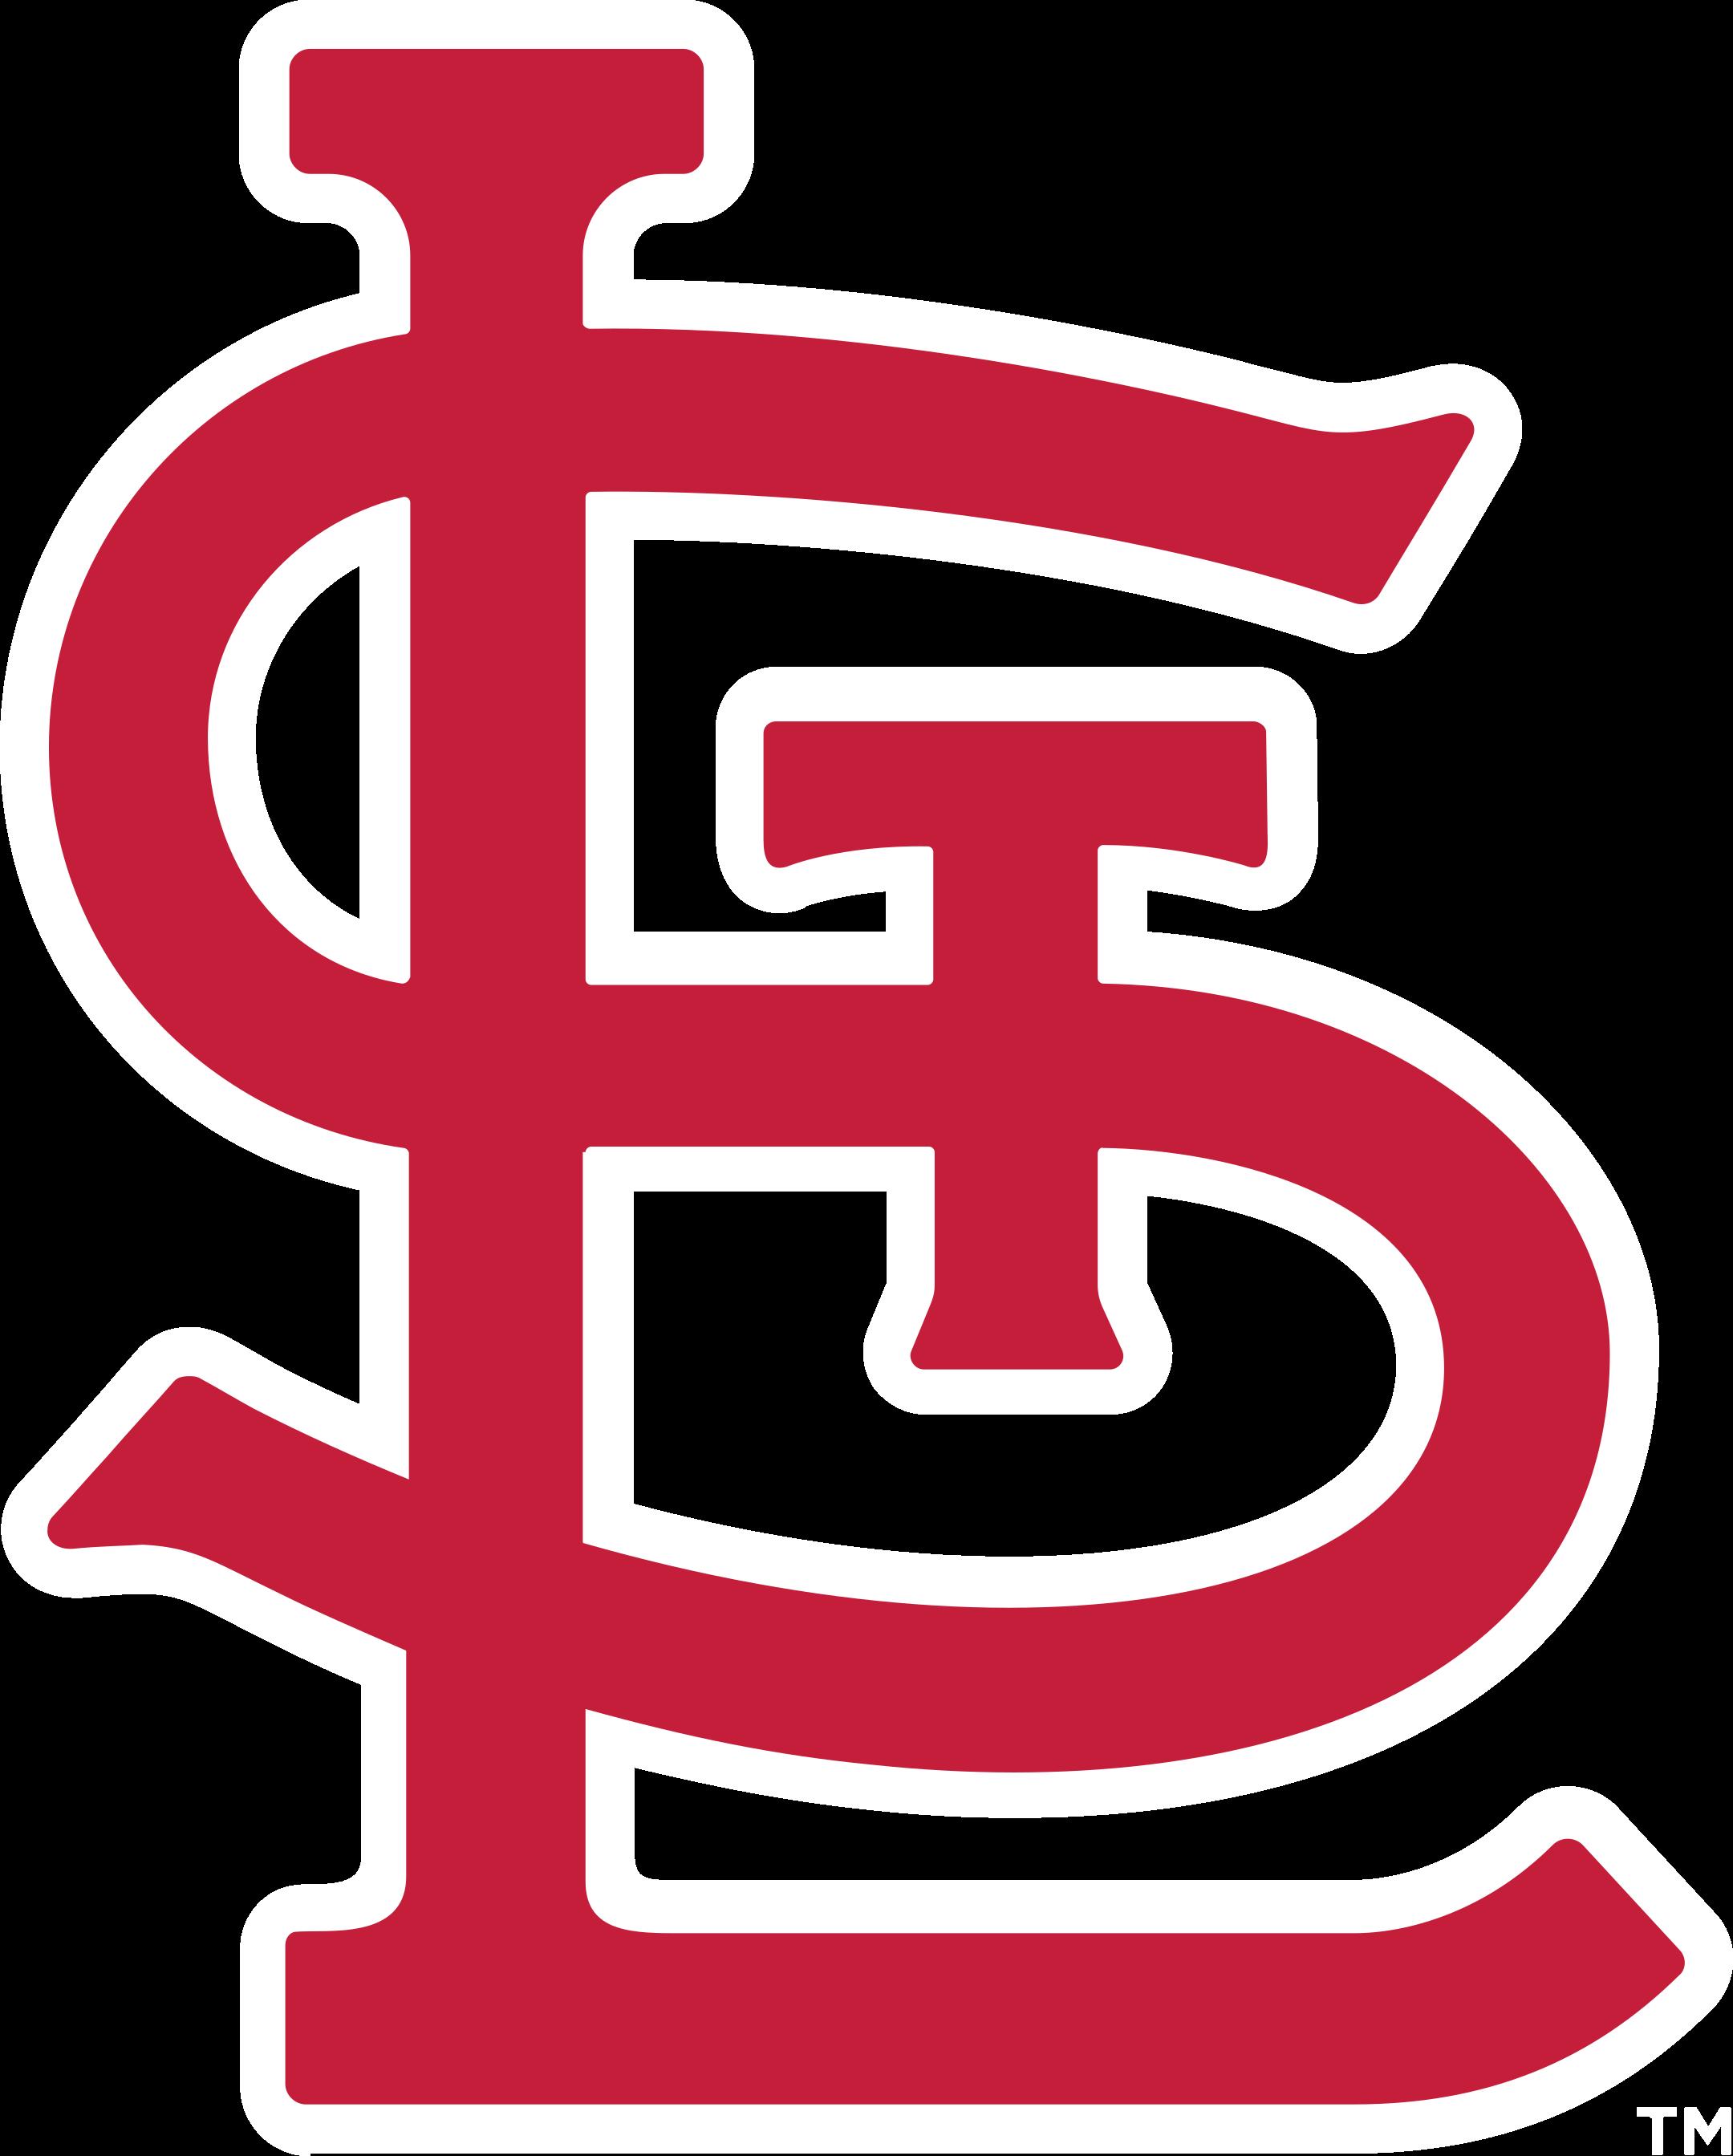 st. louis cardinals logo - png and vector - logo download  logo download